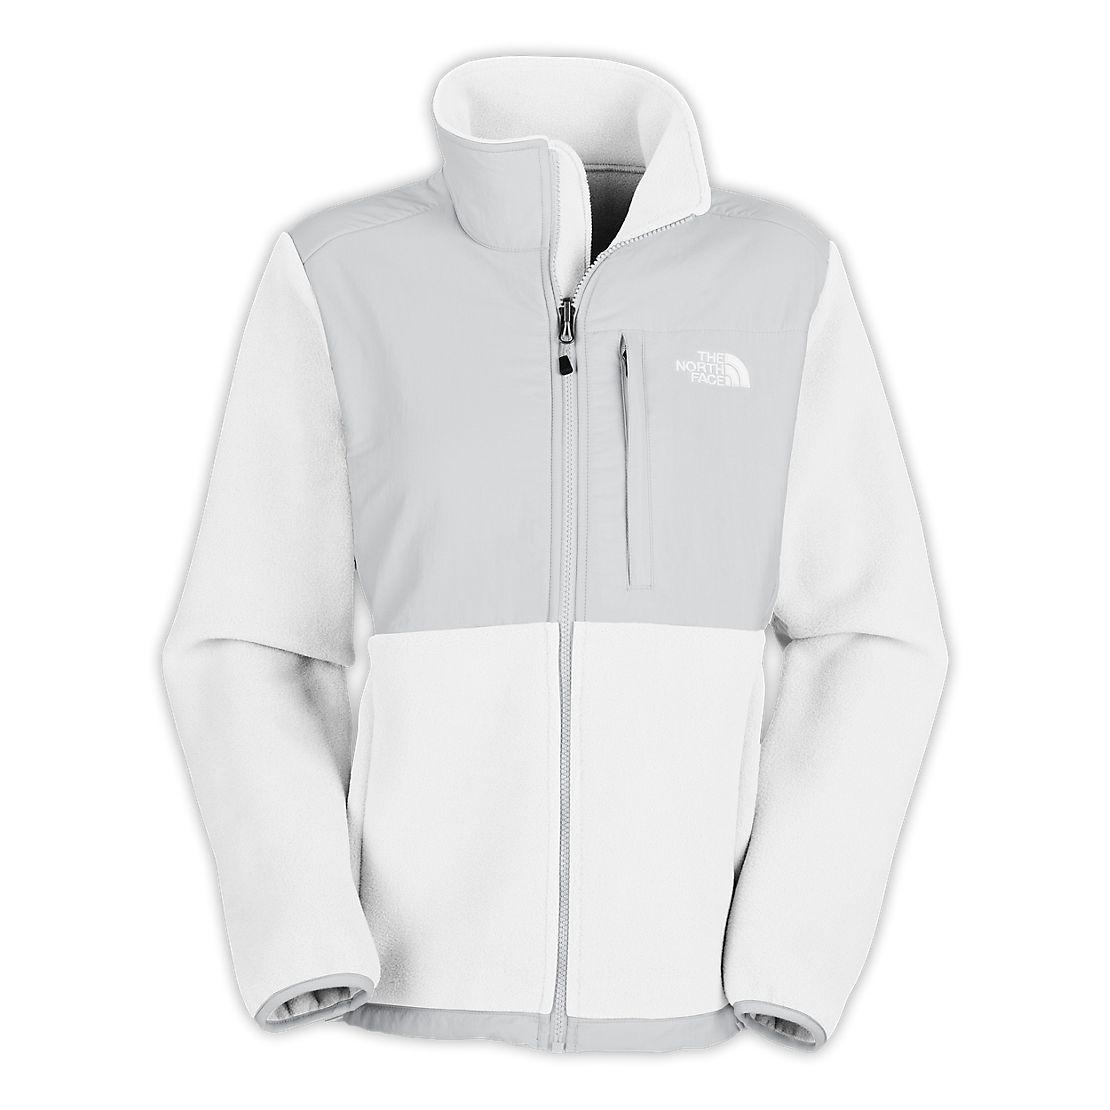 dd93adc502f1 Shop Women s Fleece Denali Jacket - The North Face